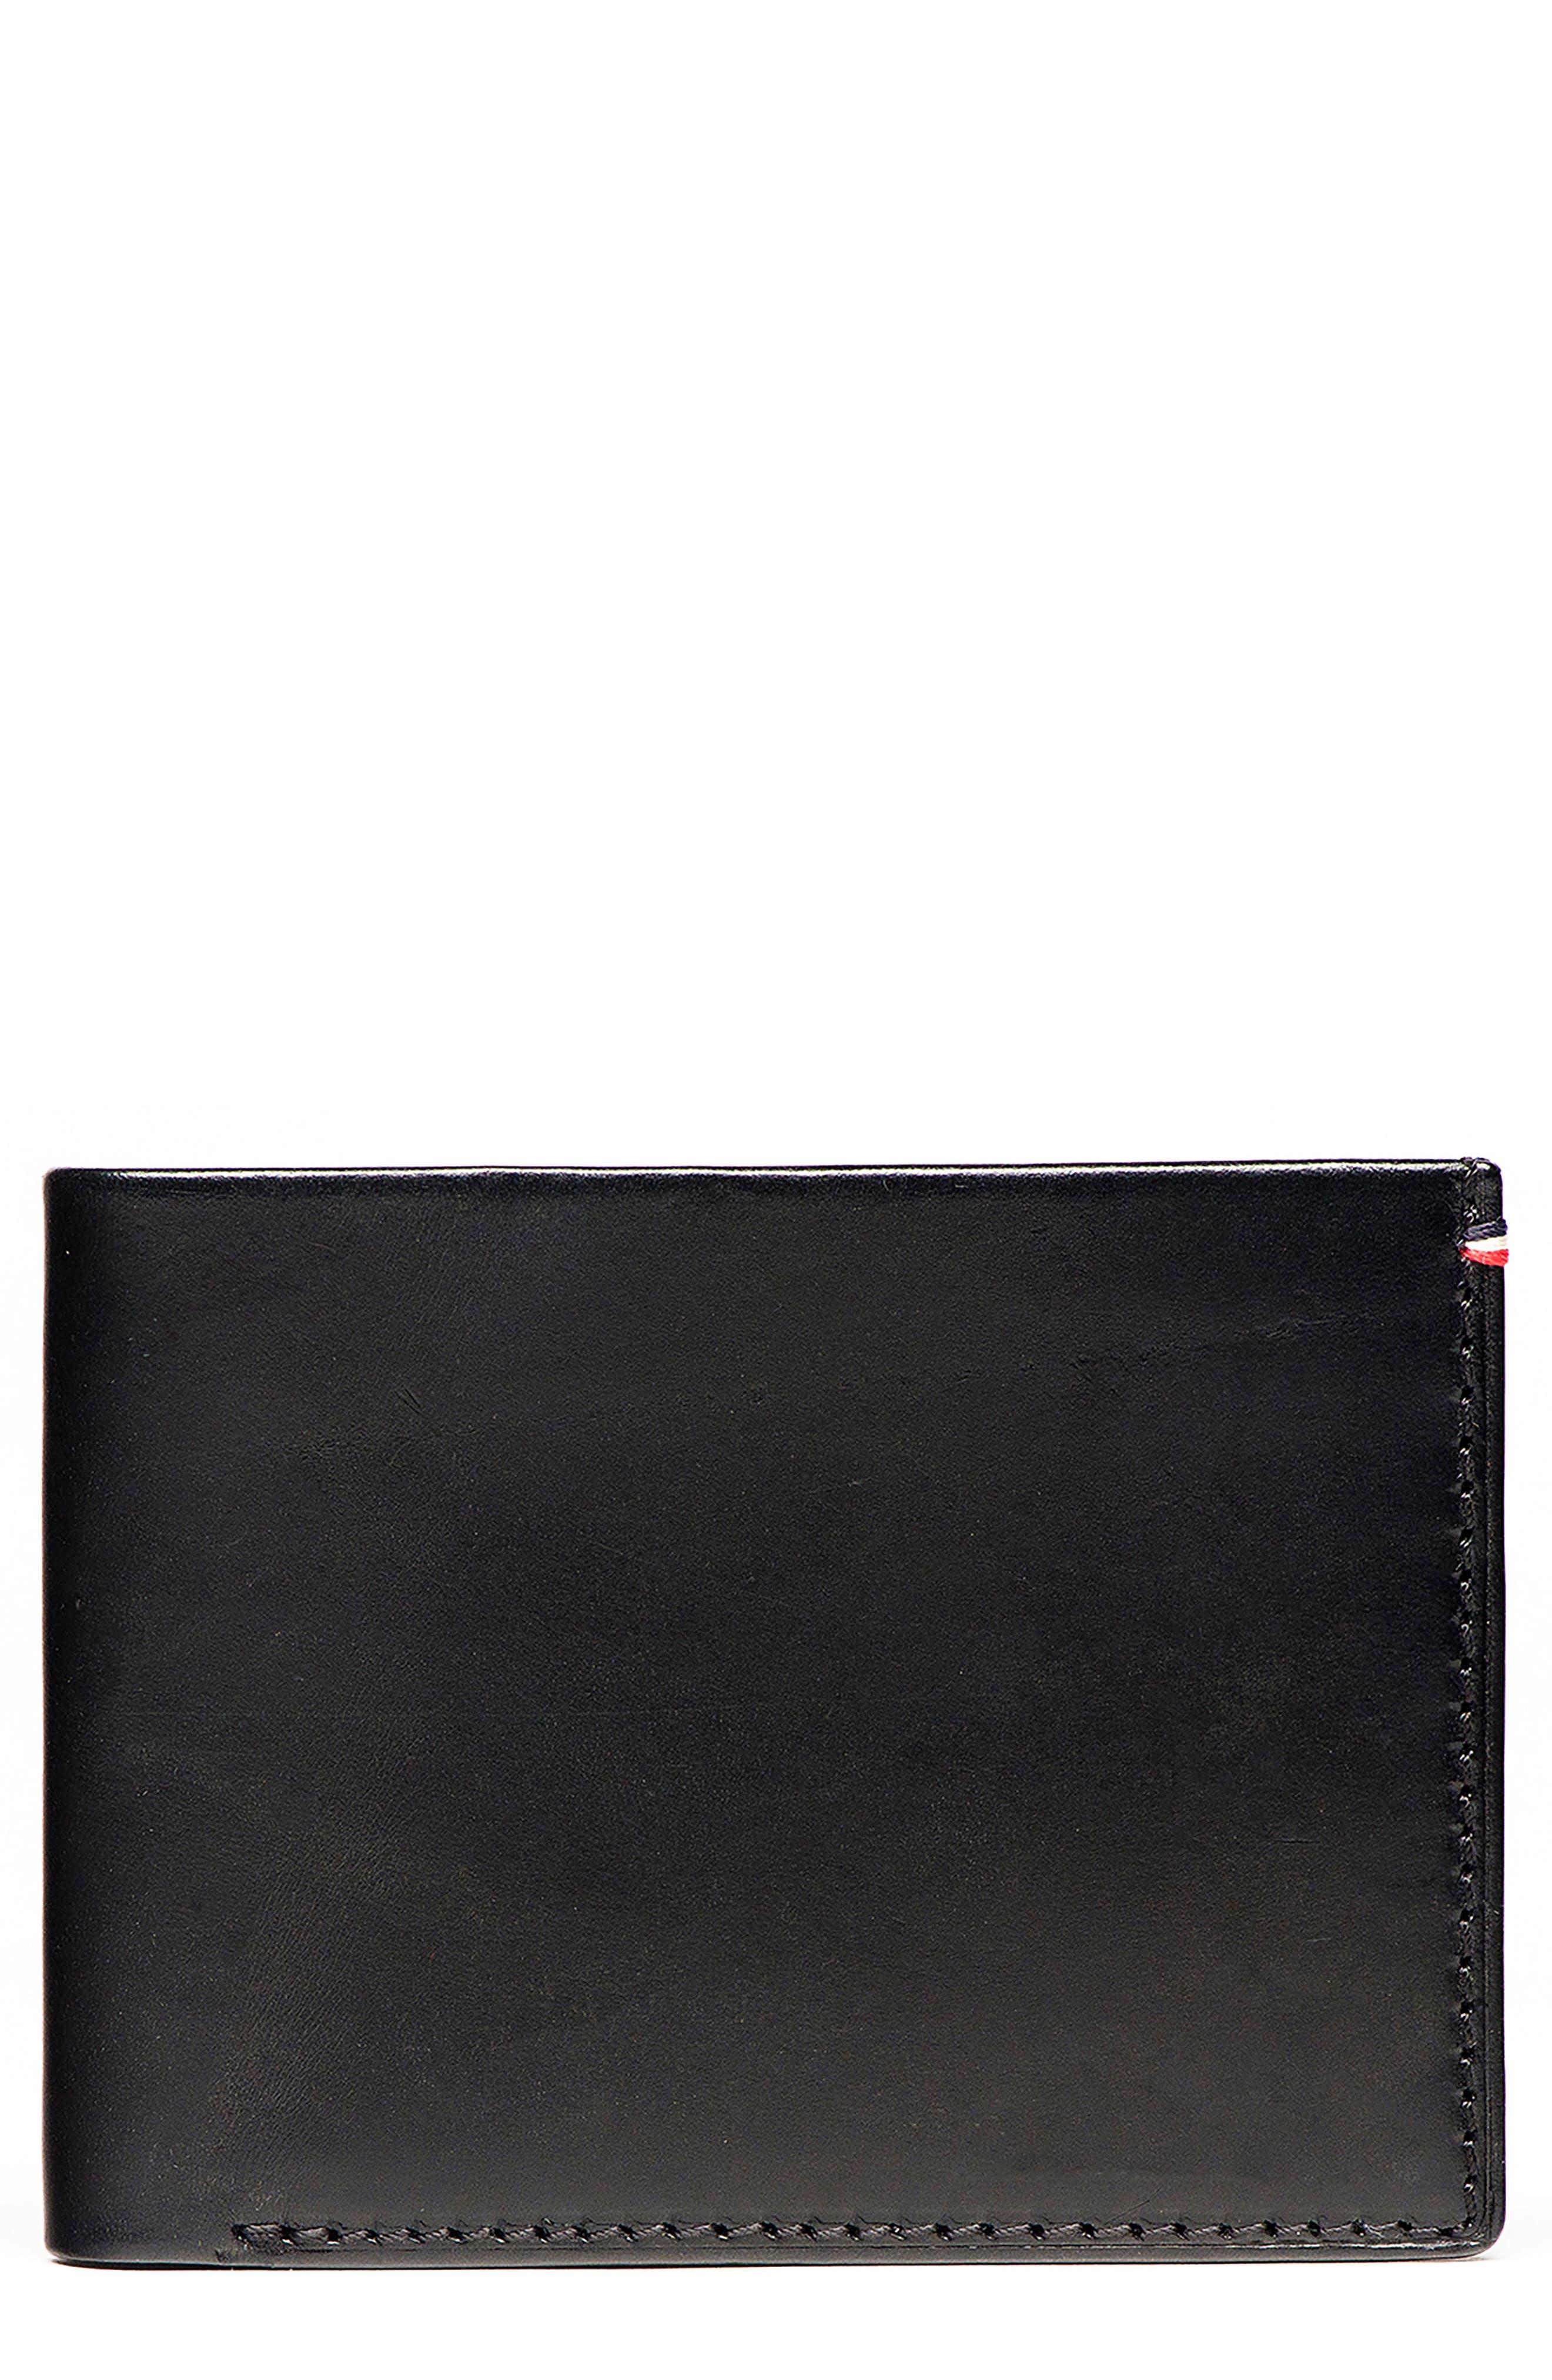 Core Leather Wallet,                         Main,                         color, 001